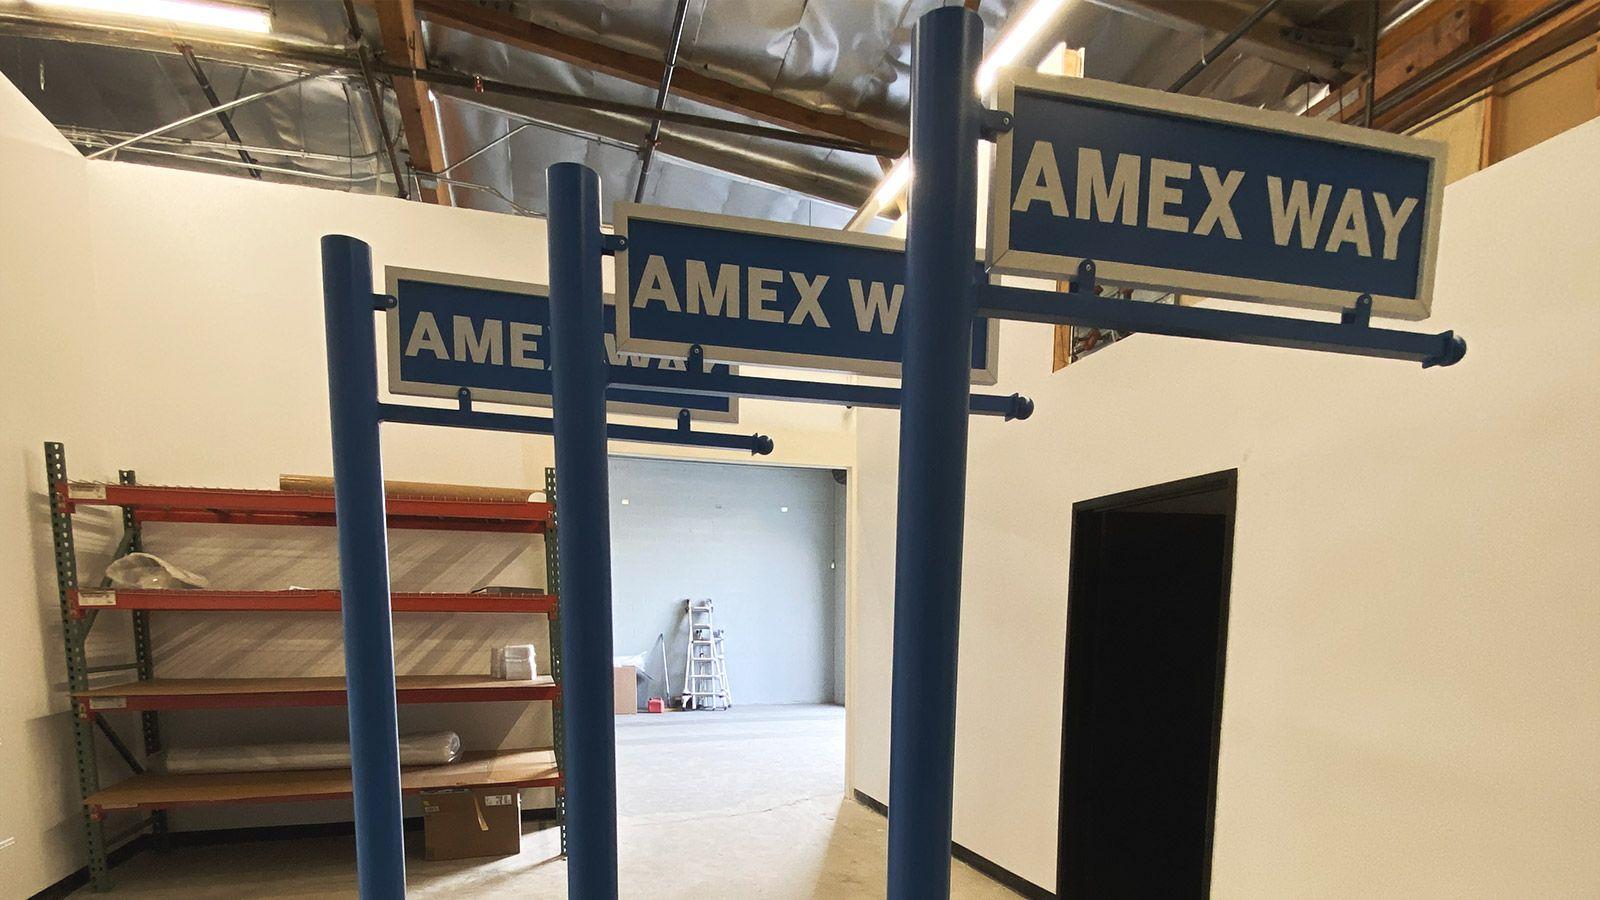 Amex Way dibond stands